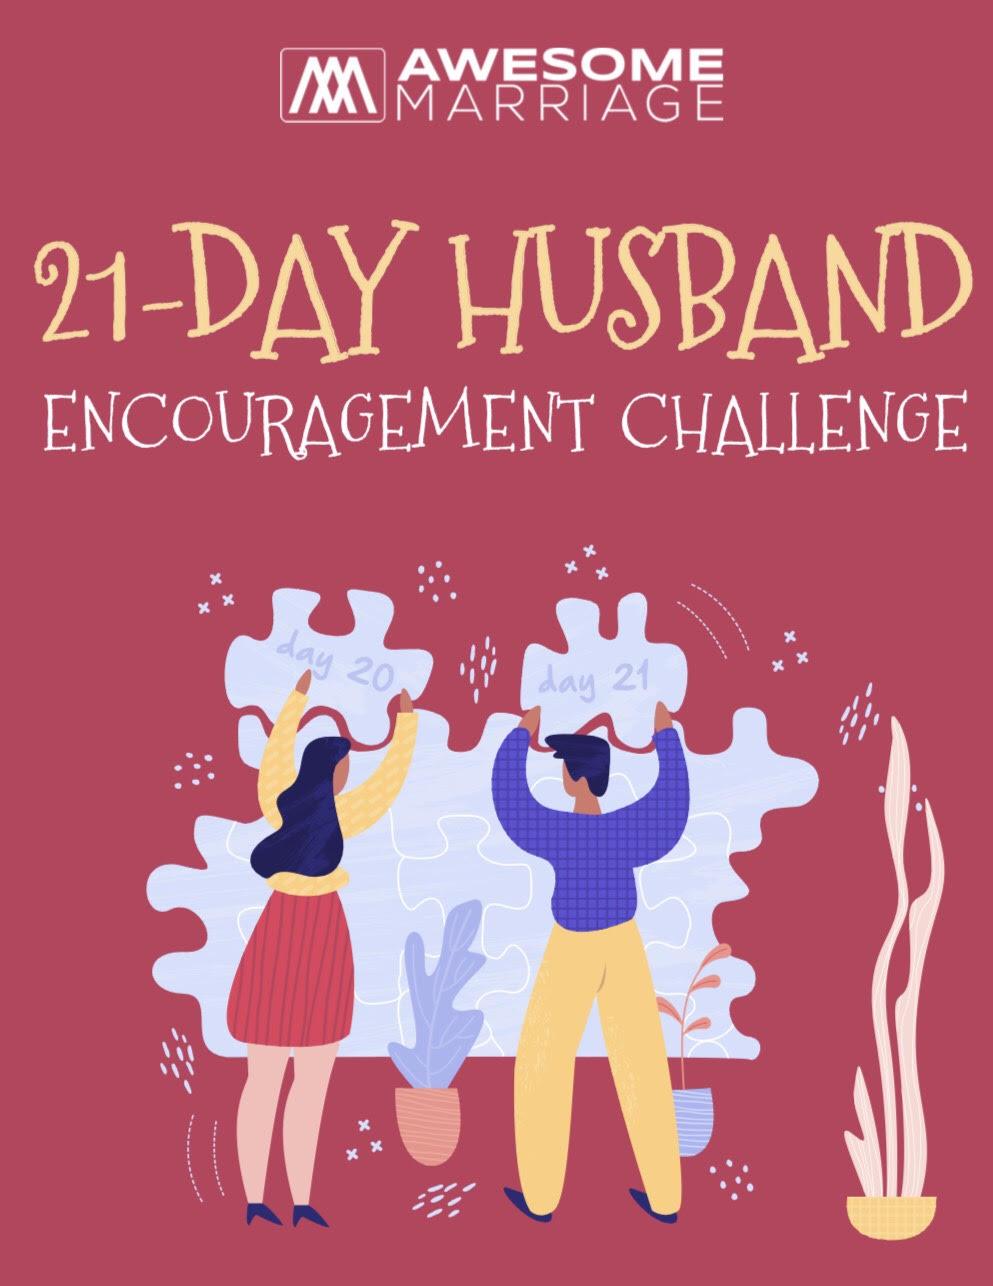 picture 21 day husband encouragement challenge.jpg